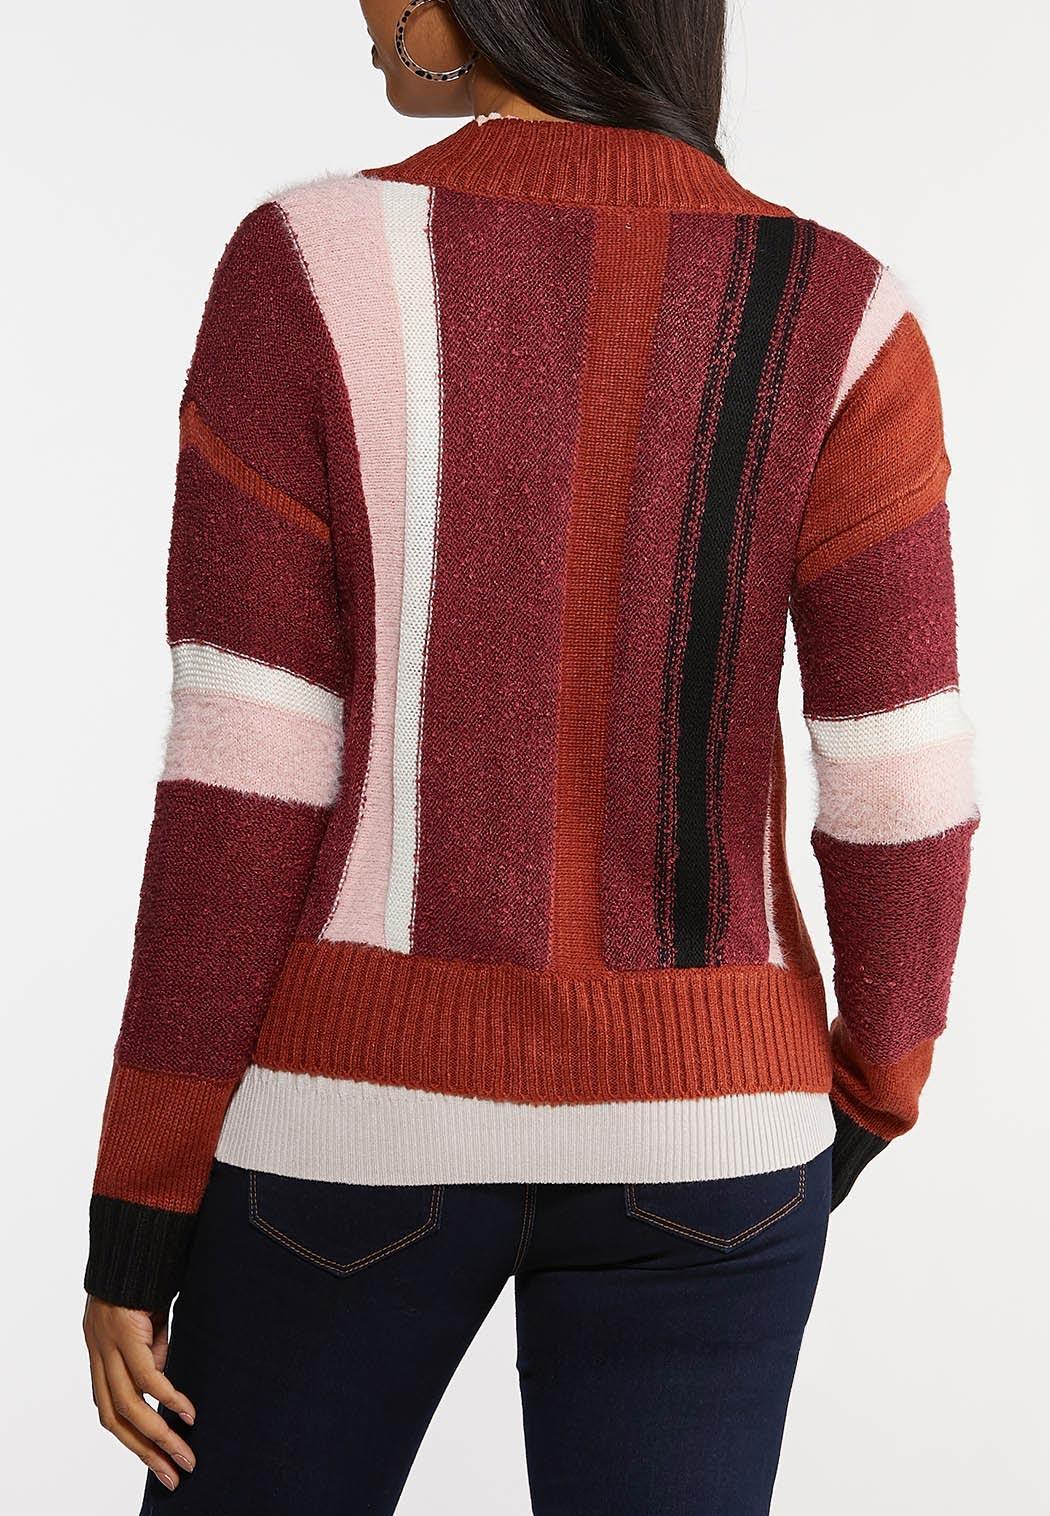 Caramel Candy Cardigan Sweater (Item #44106780)